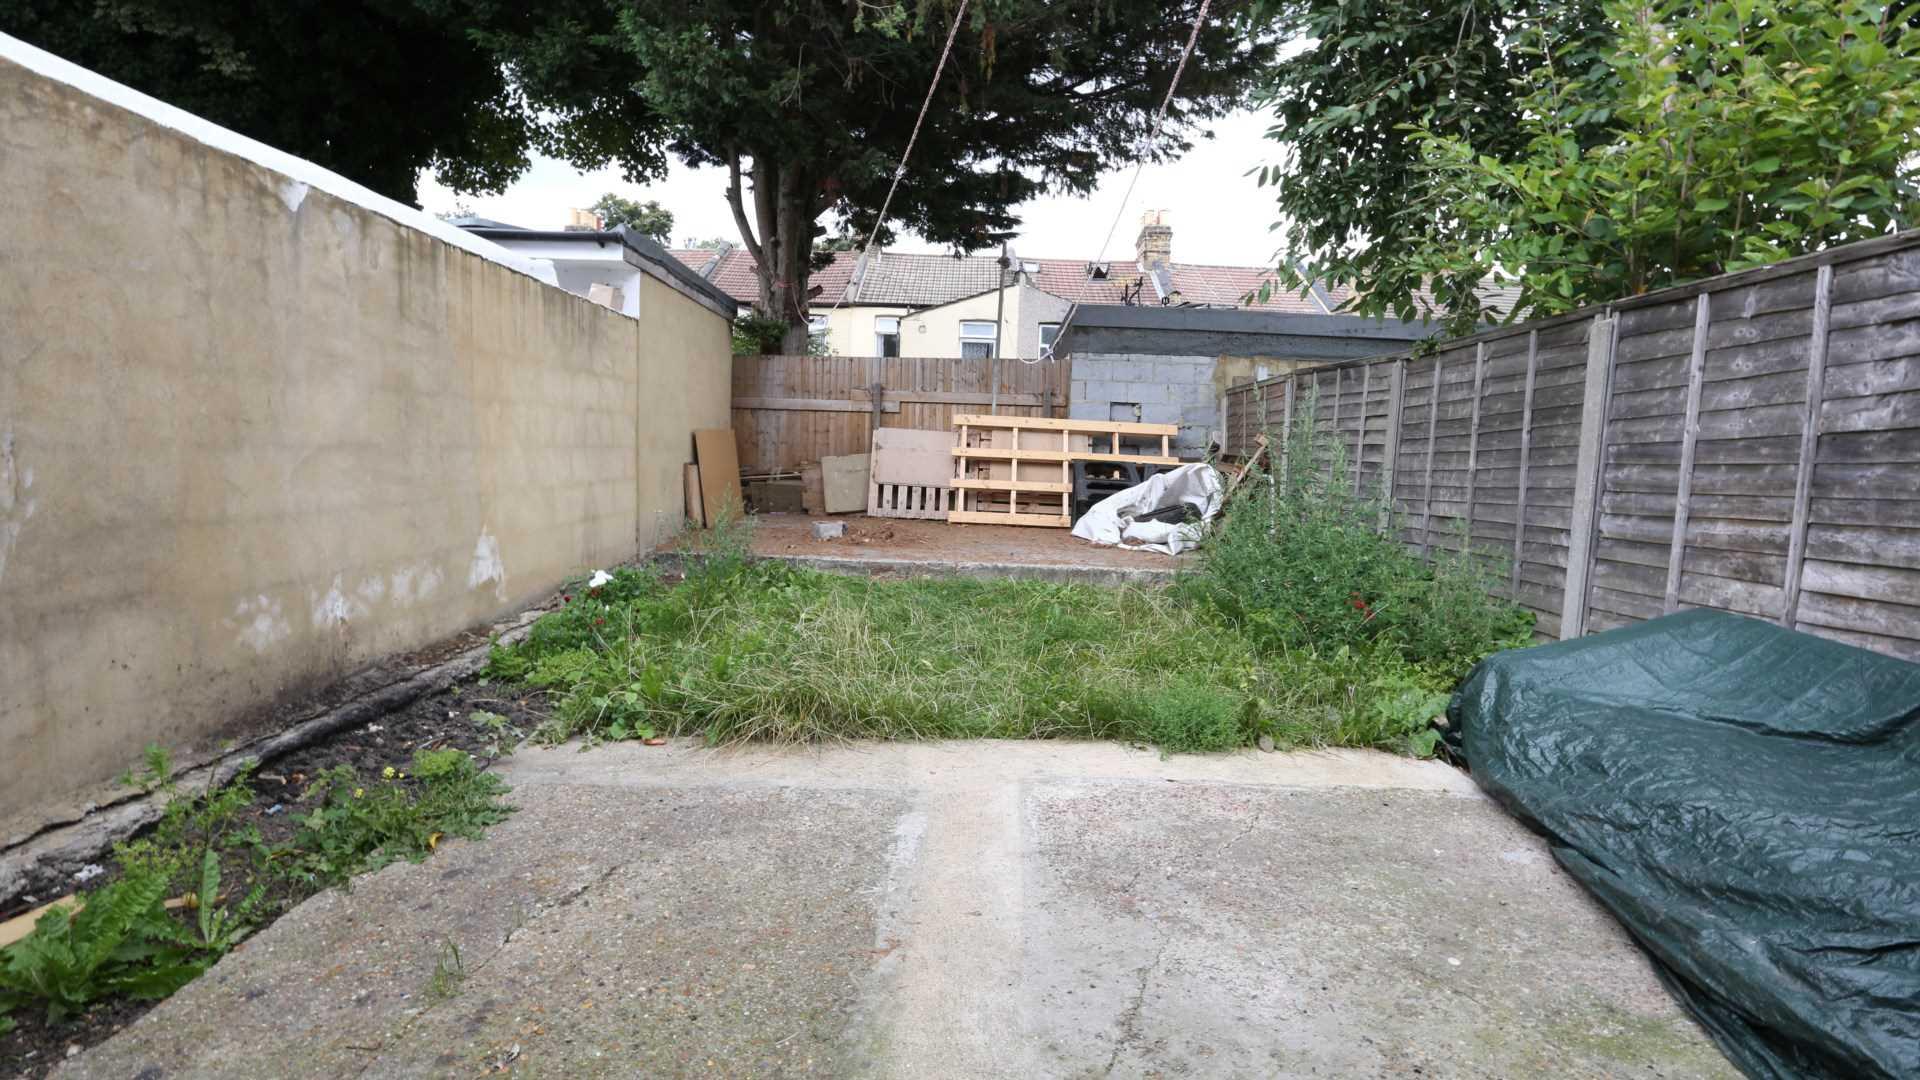 Halley Road, Manor Park, London E12, Image 9